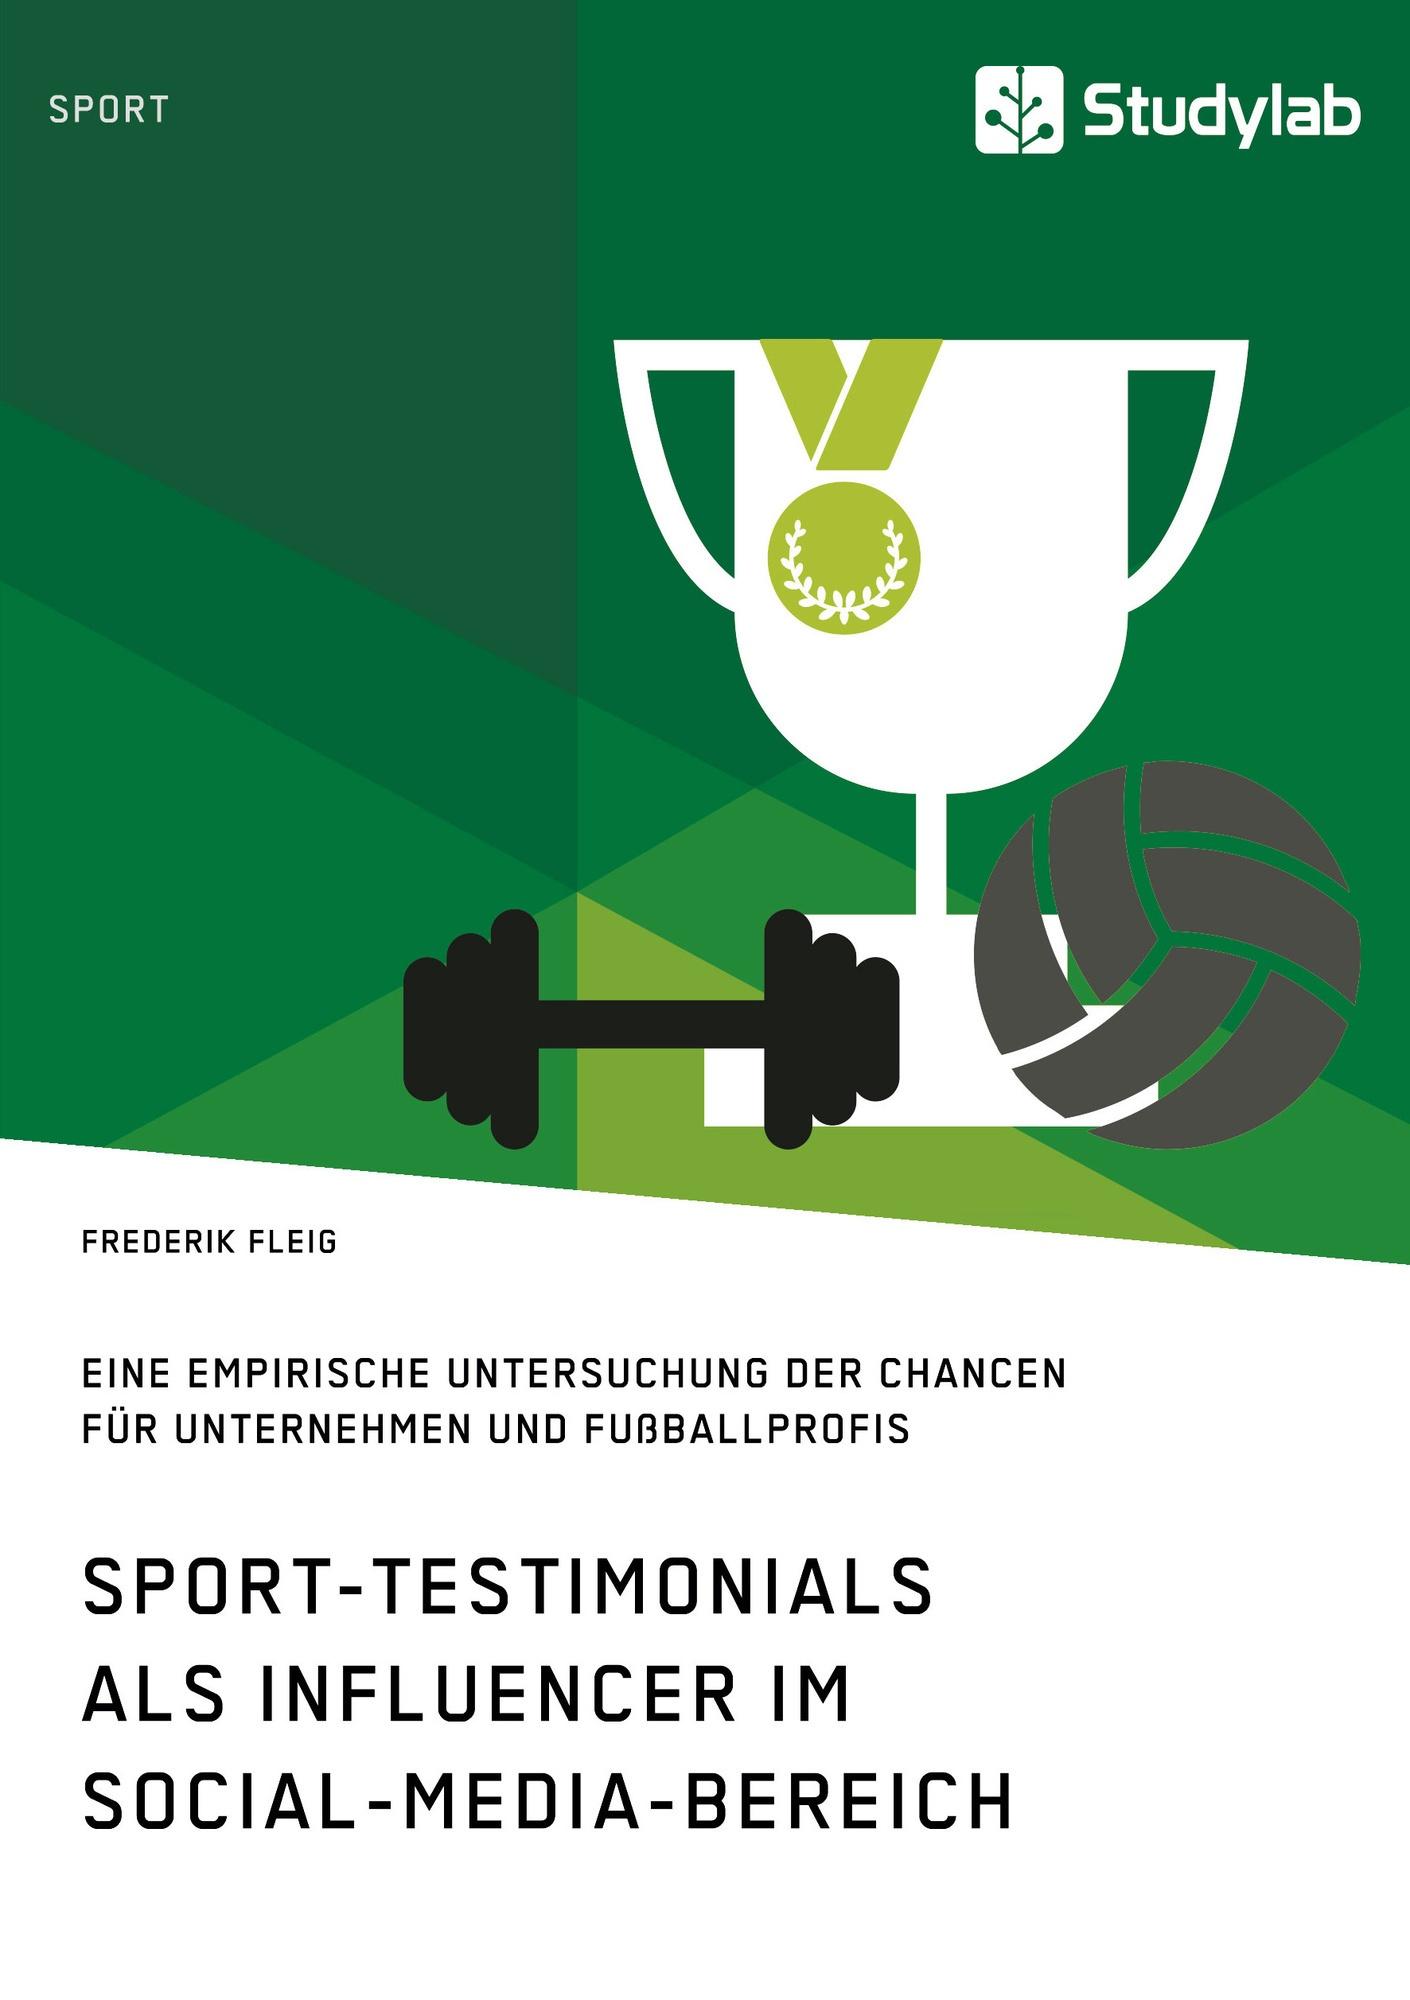 Titel: Sport-Testimonials als Influencer im Social-Media-Bereich